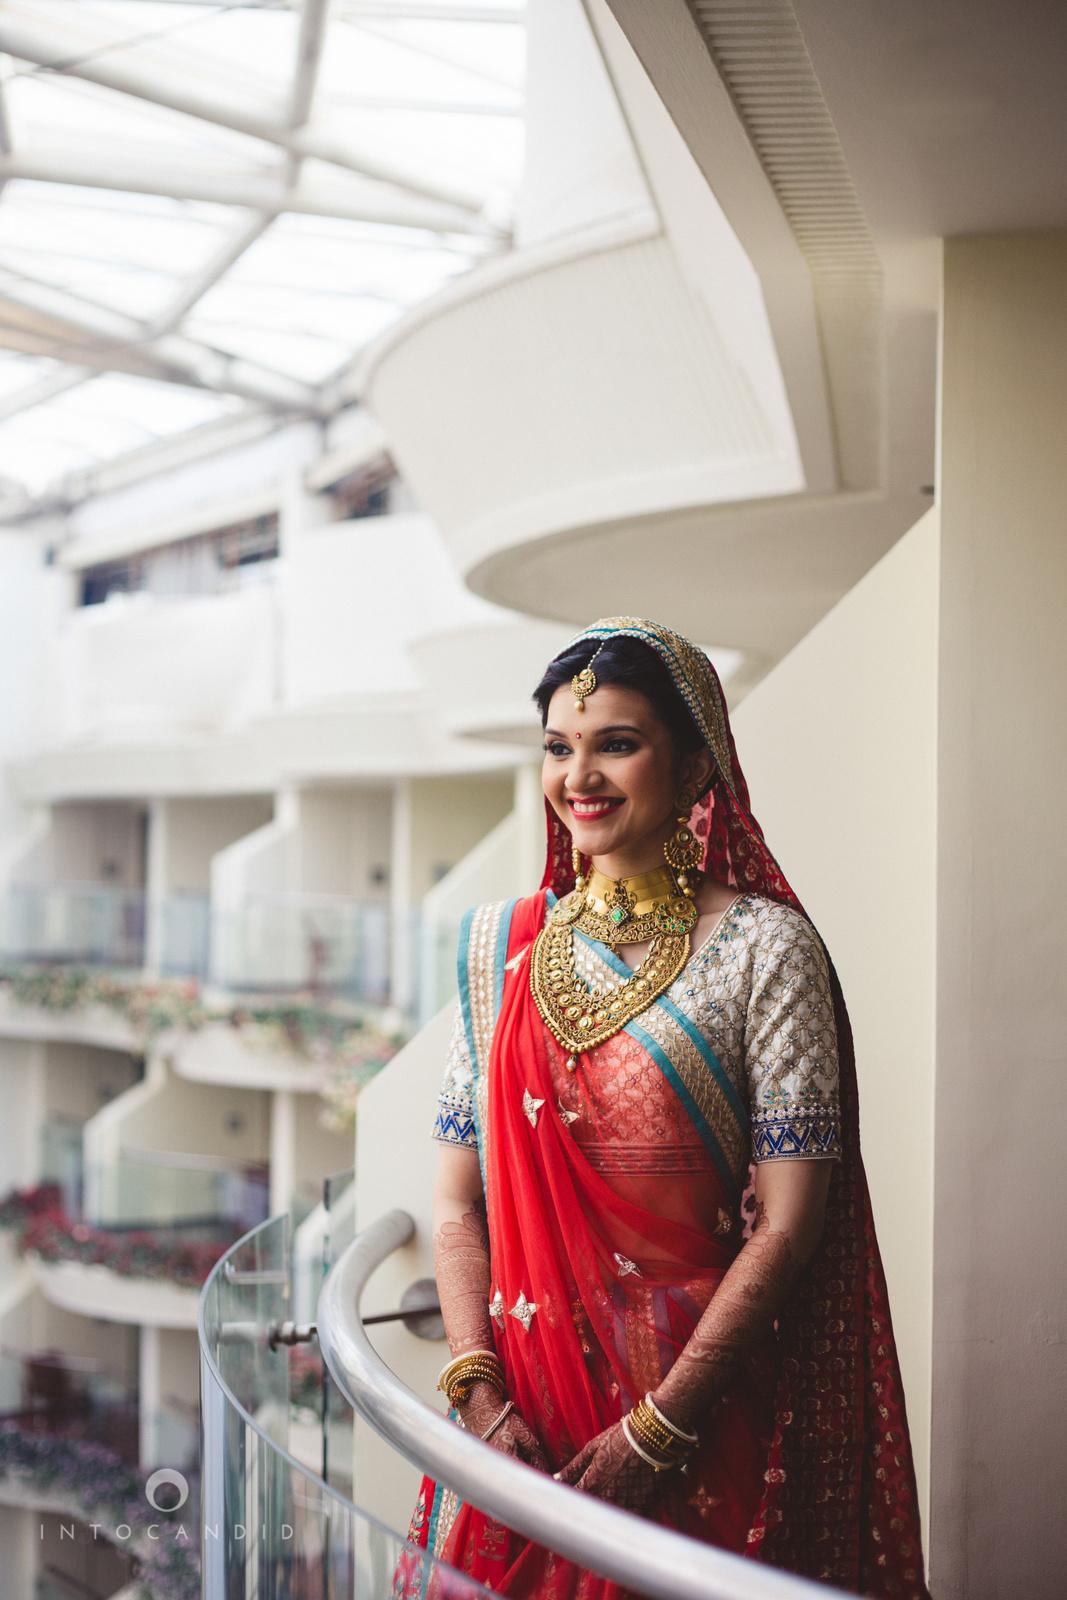 saharastar-mumbai-hindu-wedding-photography-intocandid-ma-15.jpg